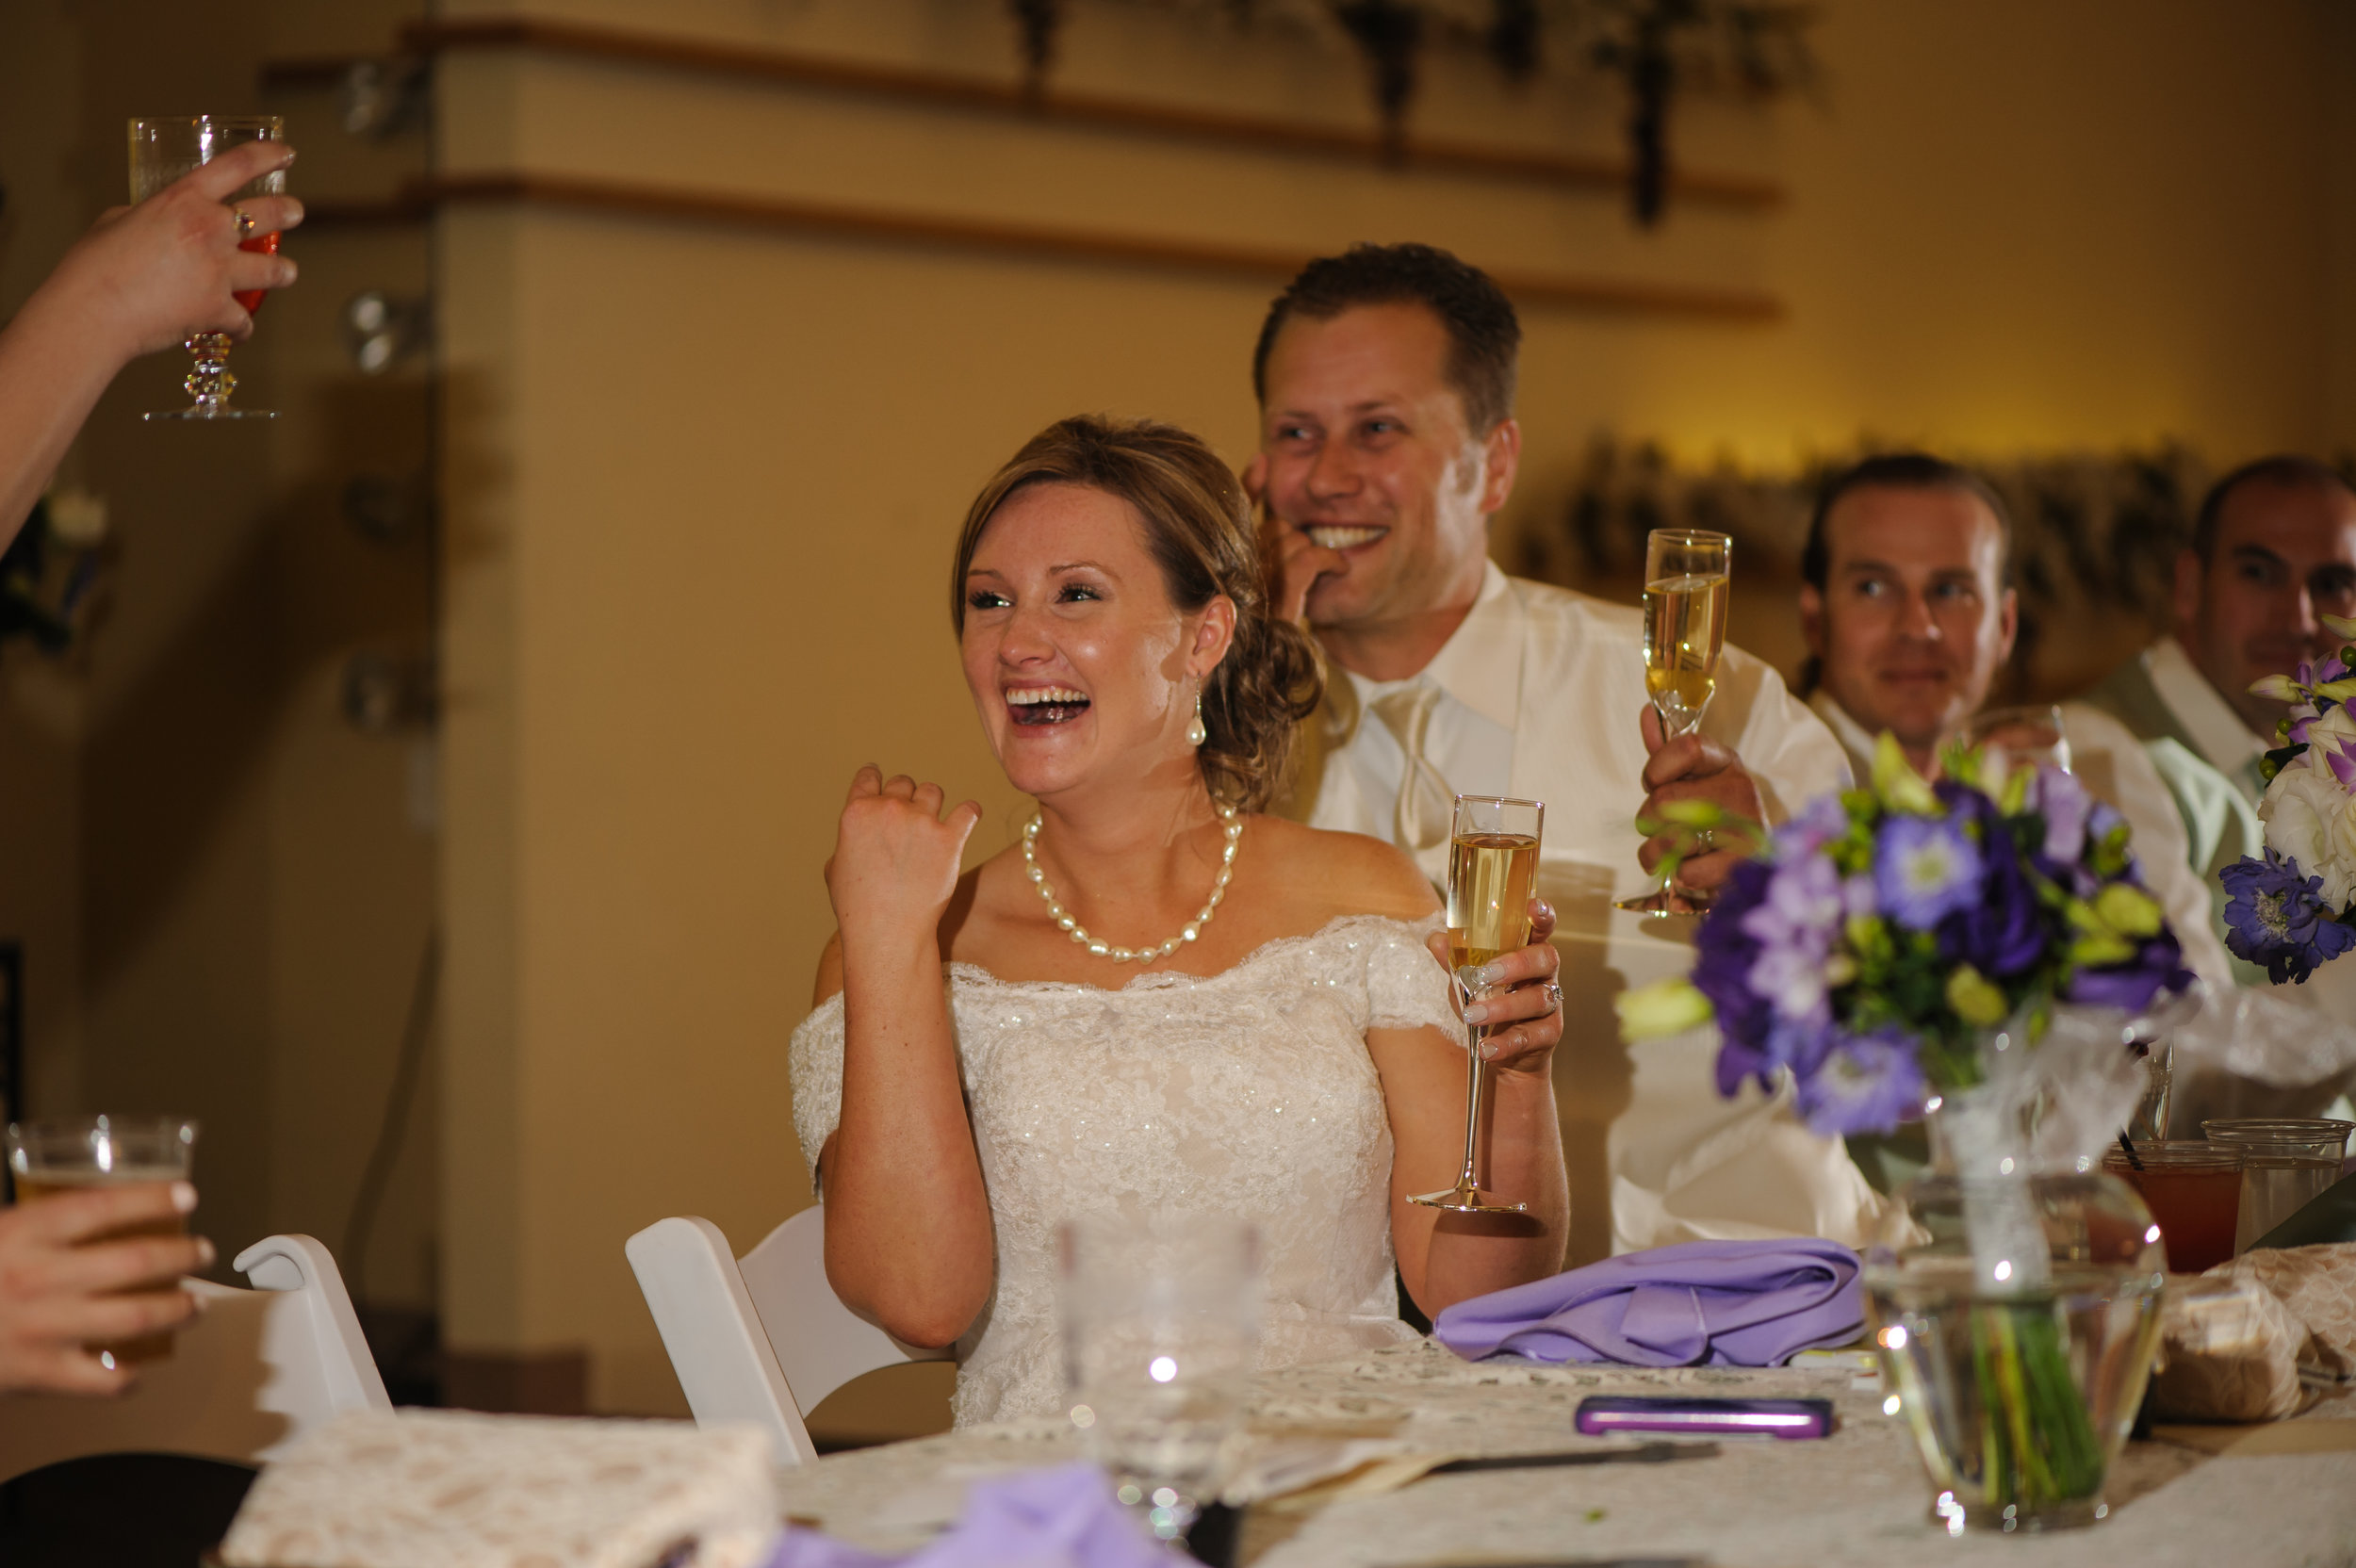 danielle-ross-029-sacramento-wedding-photographer-katherine-nicole-photography.JPG